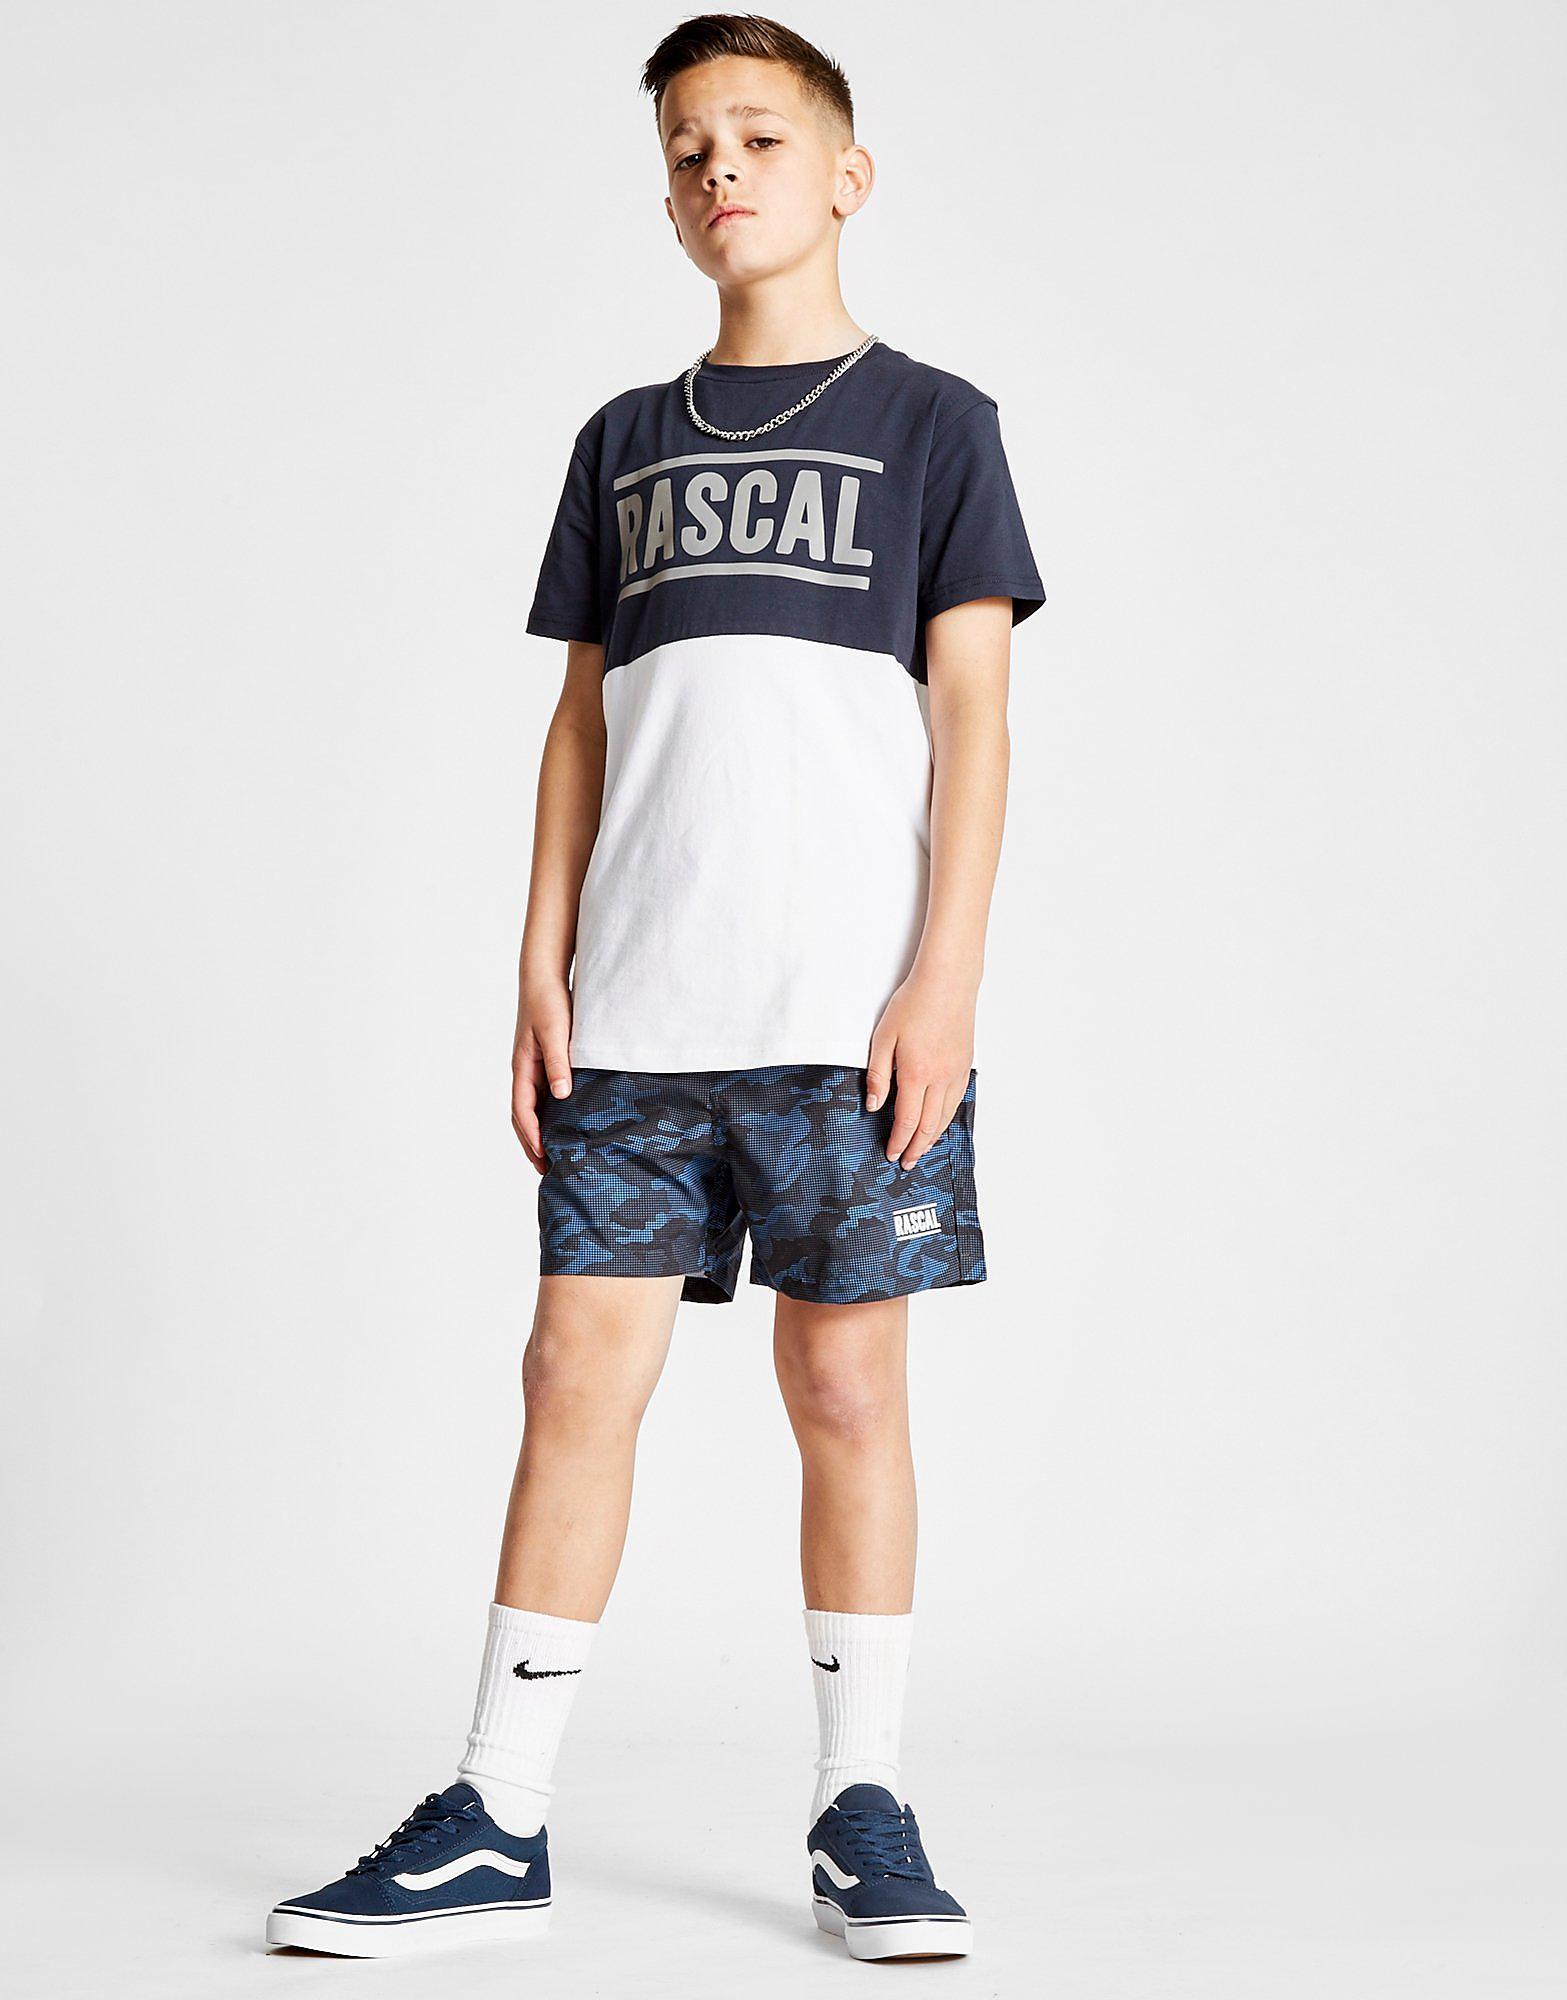 Rascal Camo Print Swim Shorts Junior